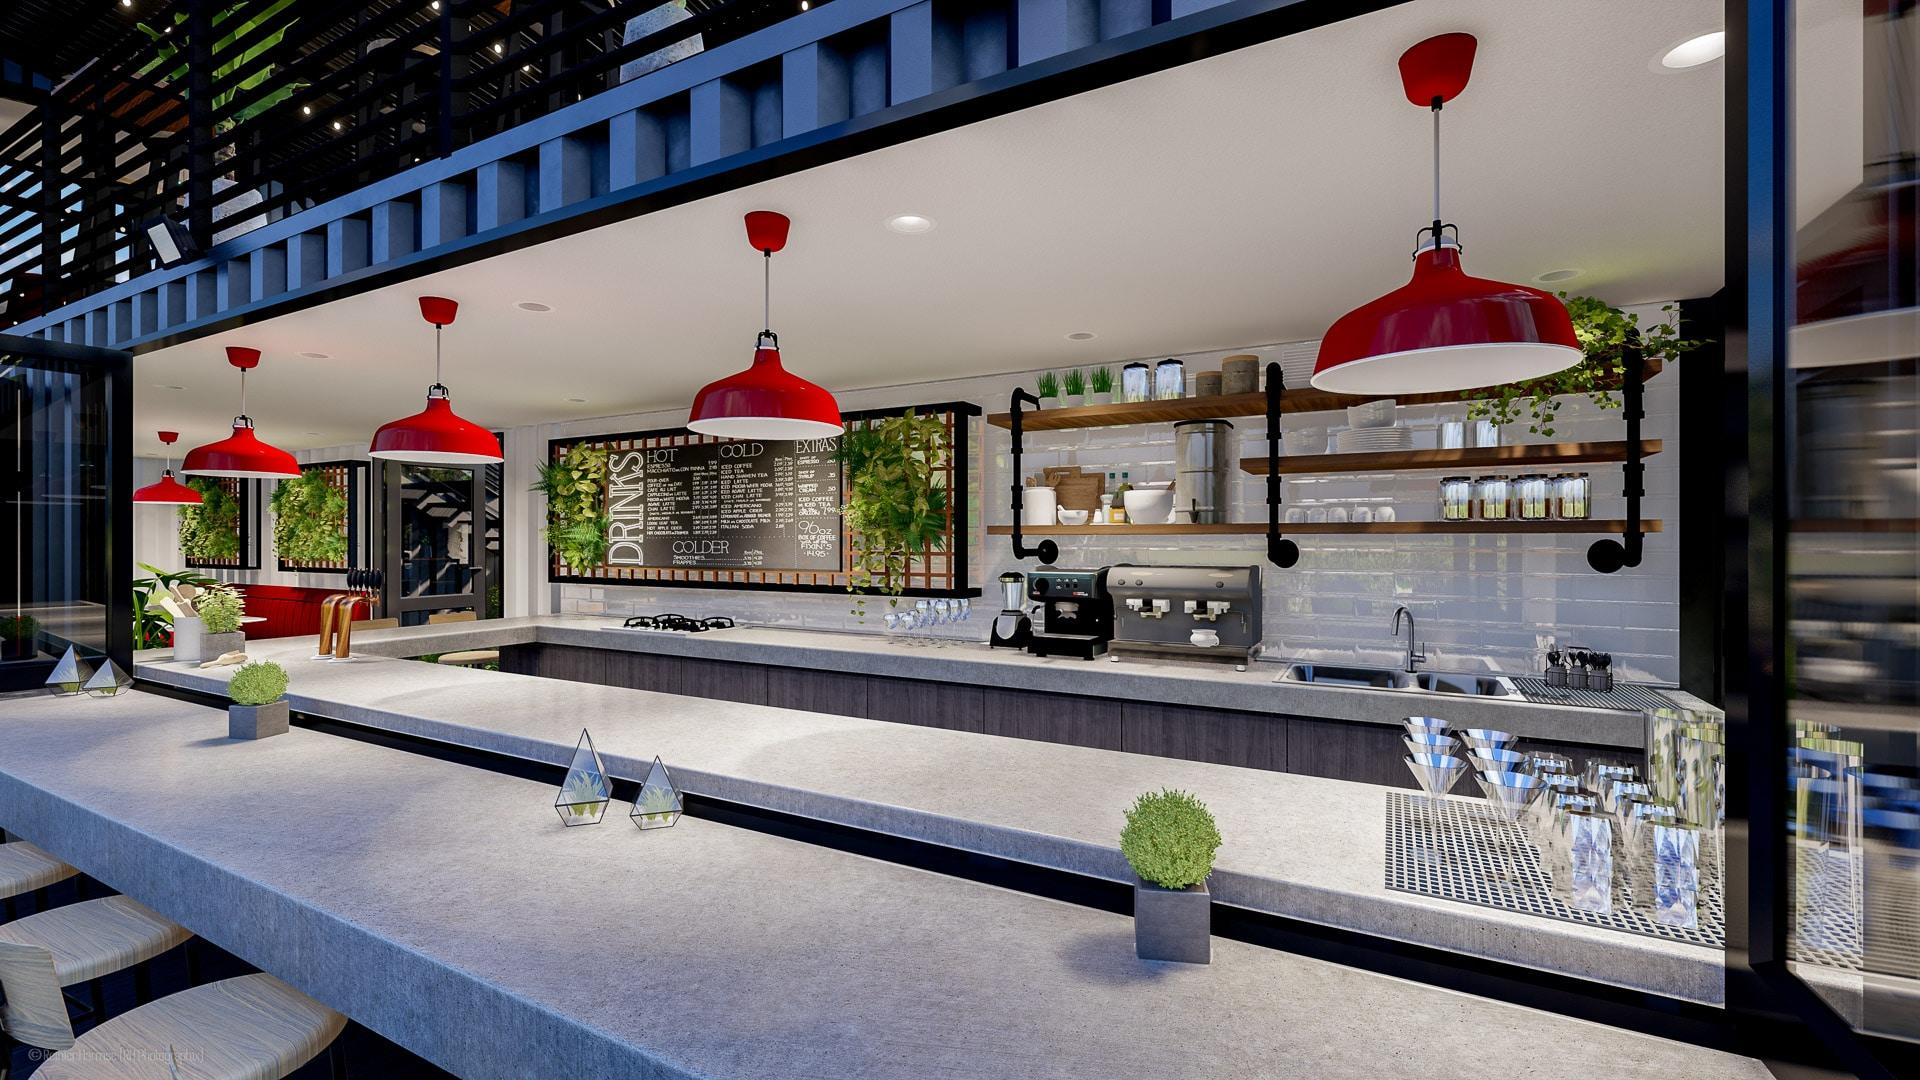 RHPX_Portfolio_LVR Container Restaurant-23